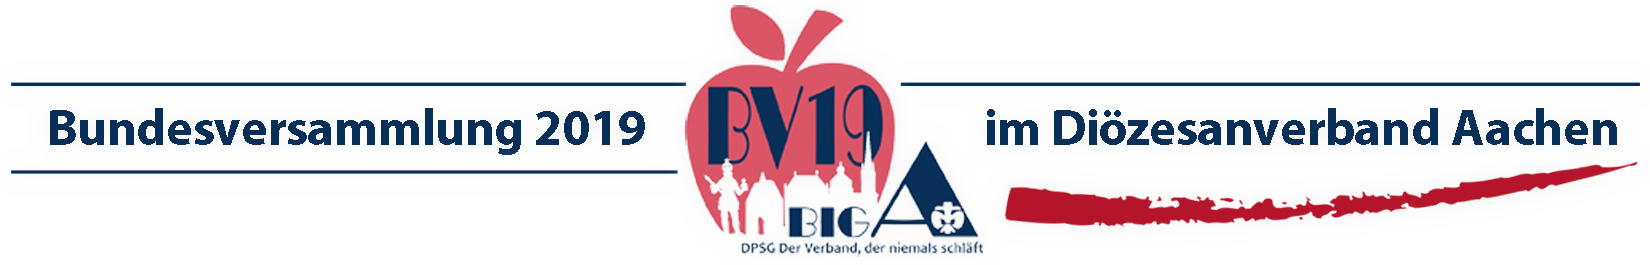 85. Bundesversammlung 2019